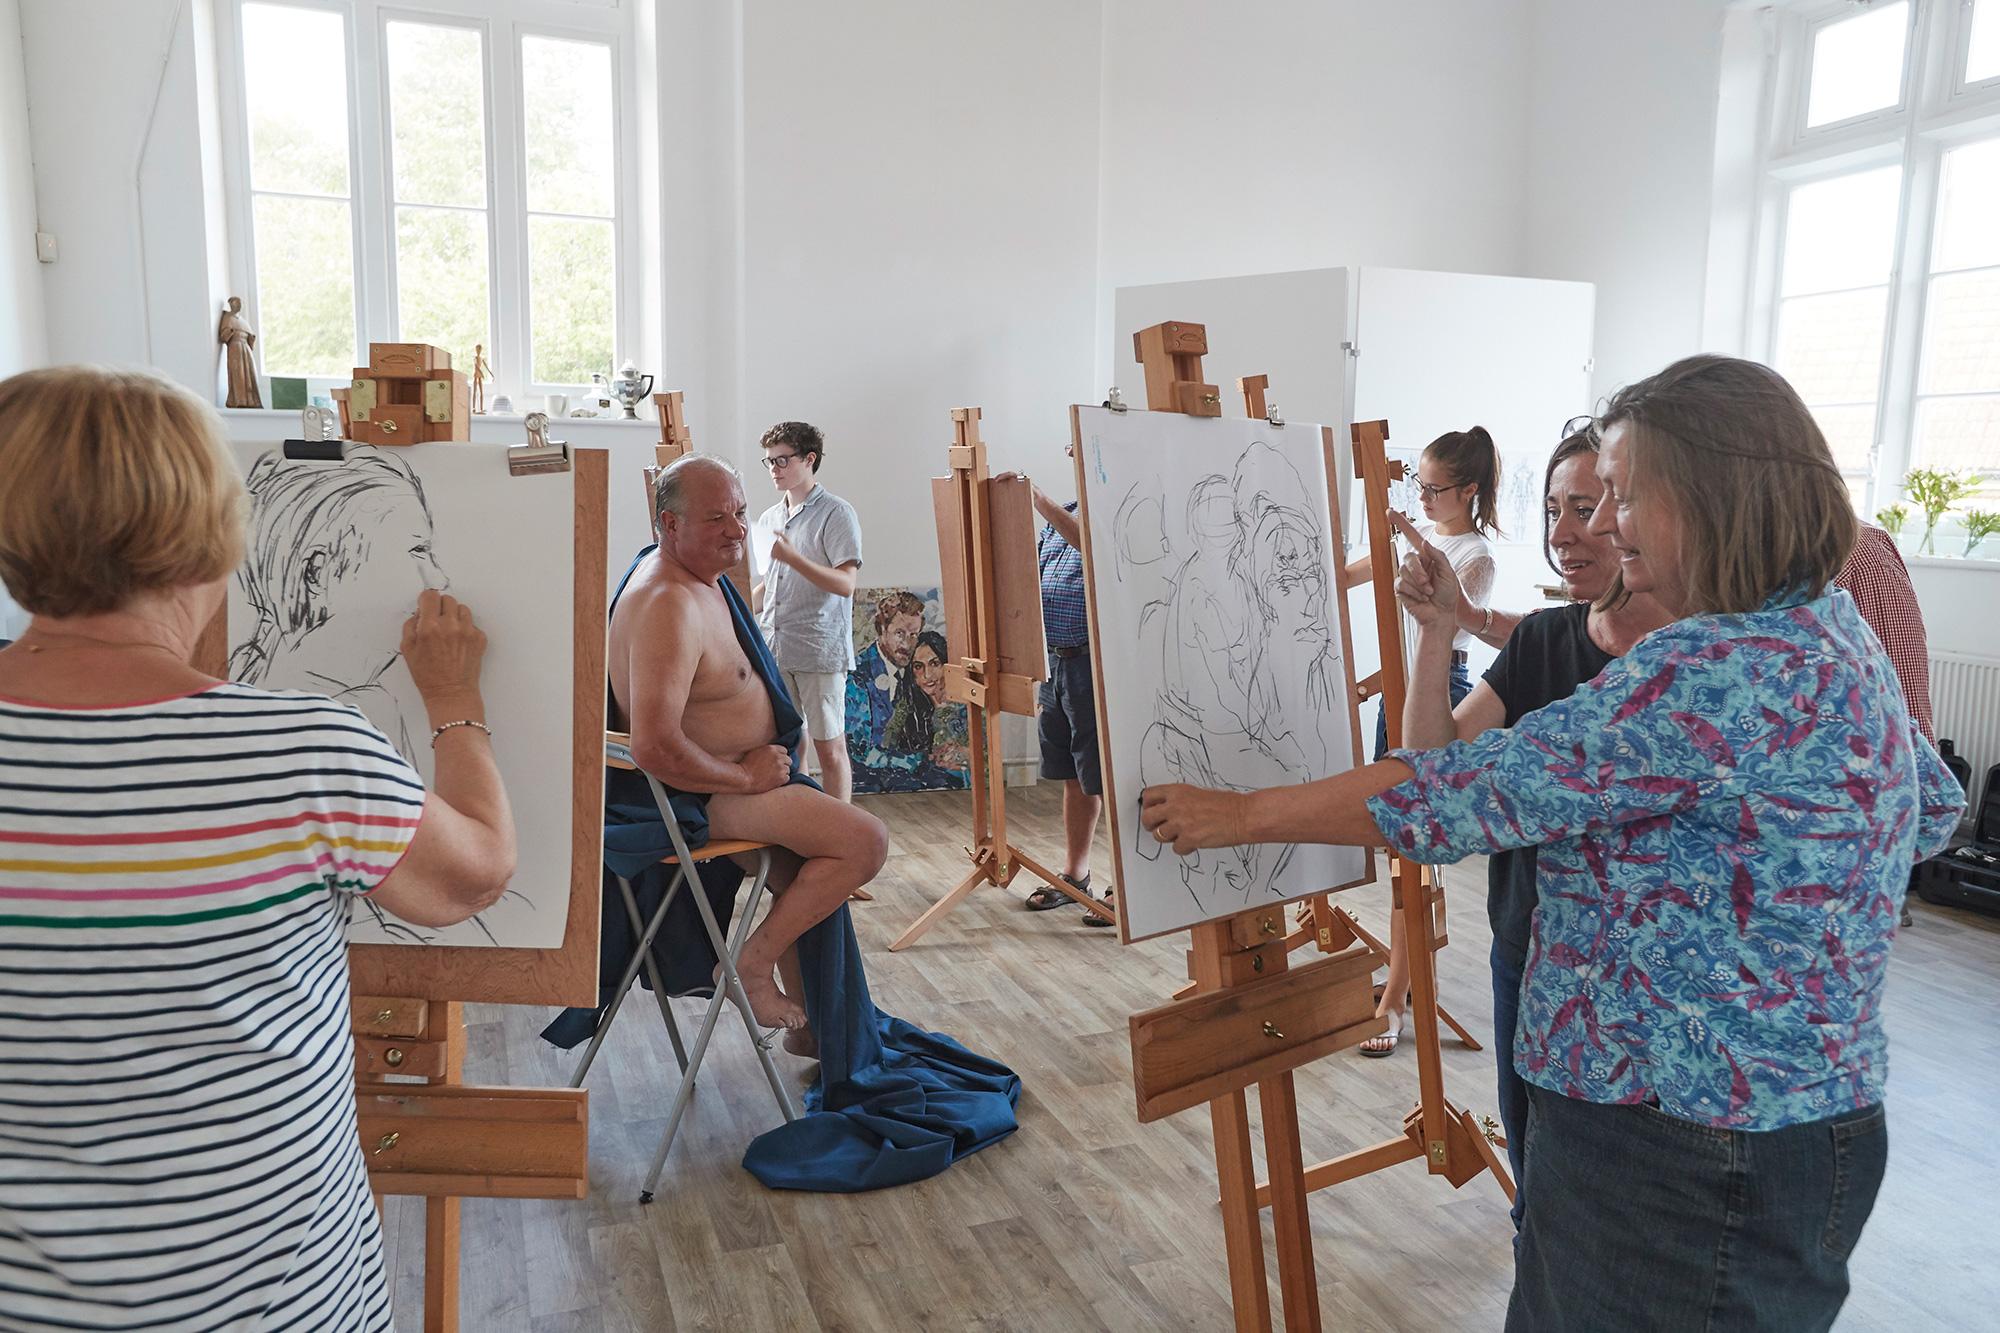 life-drawing-classes-yardley-arts-3.jpg